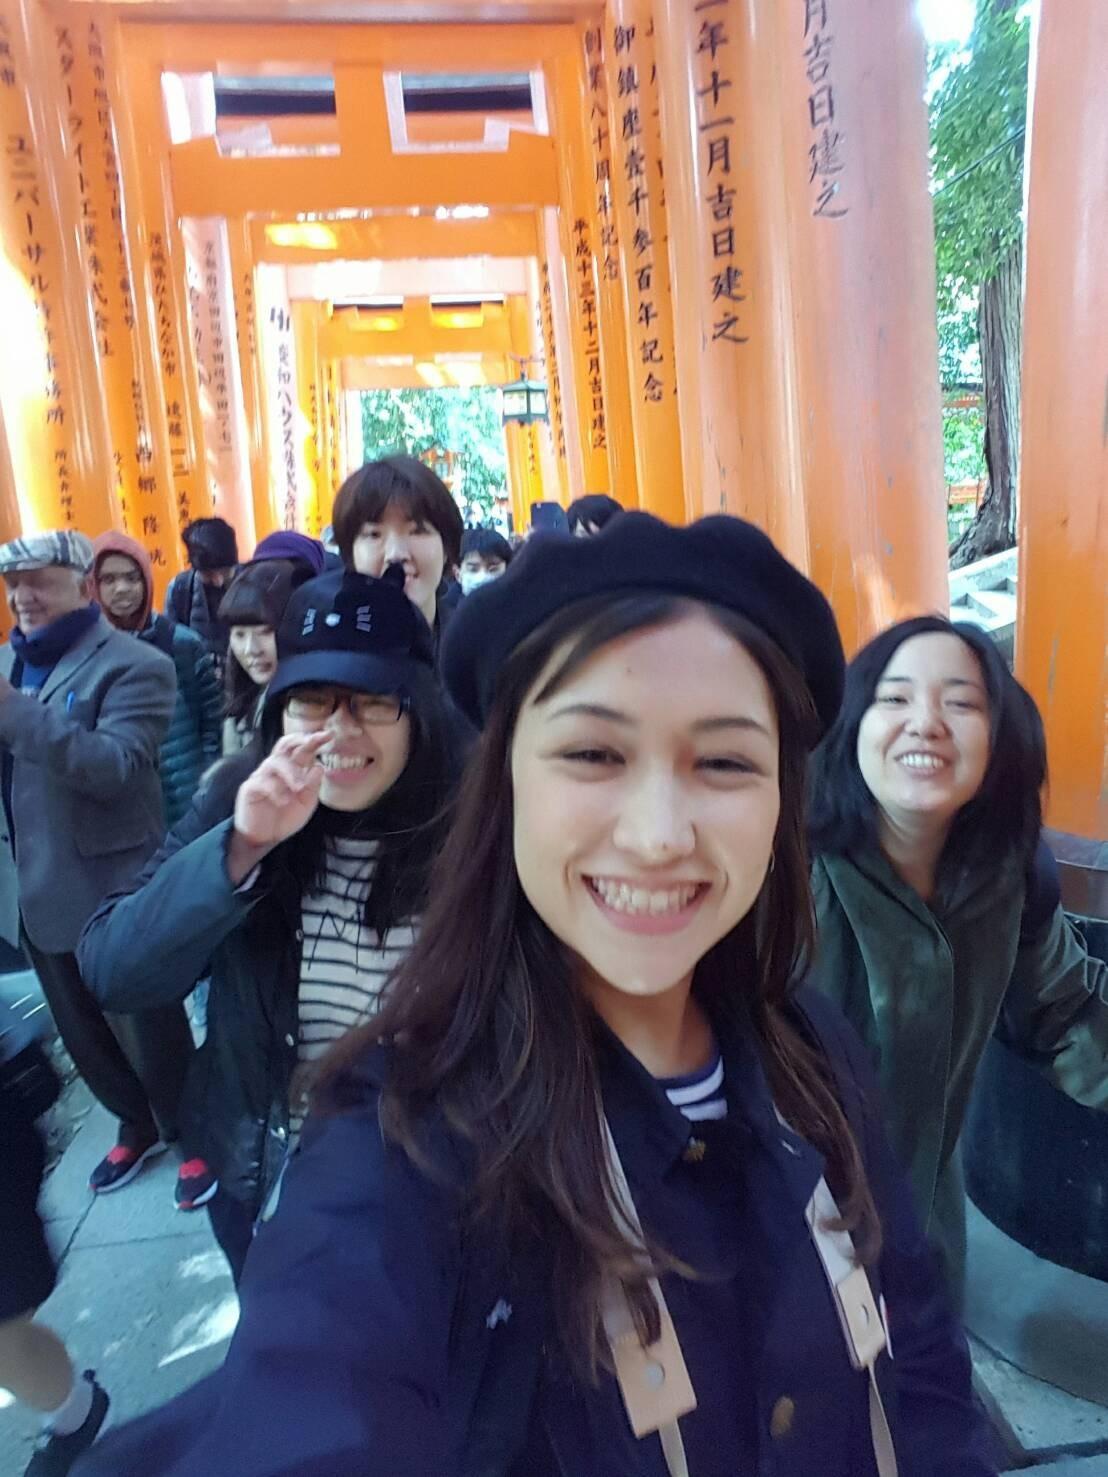 Minami from USC Studying Overseas at DoshishaUniversity